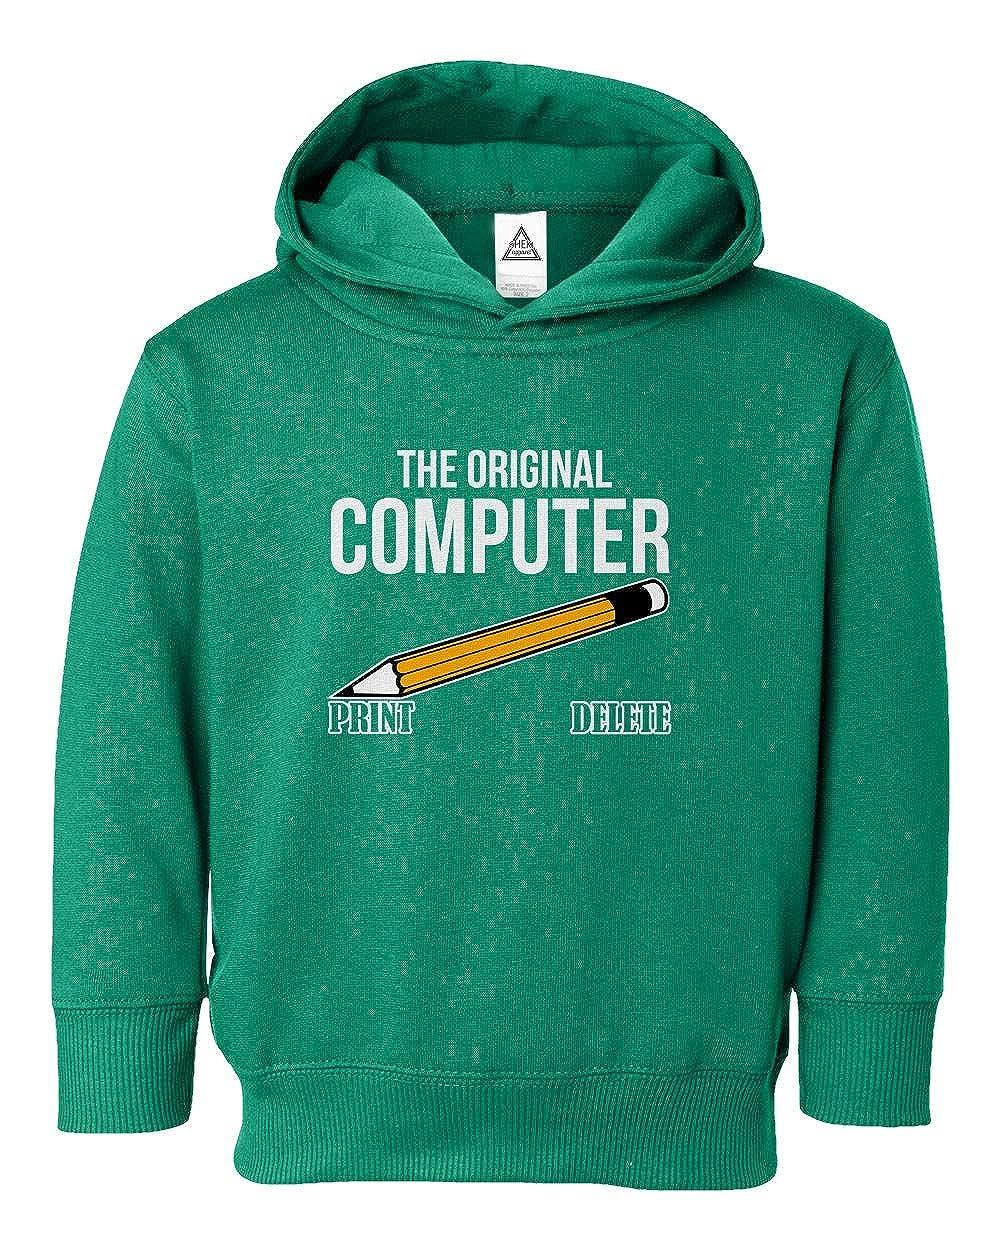 The Original Computer Geek Nerd Little Kids Hoodie Toddler Sweatshirt